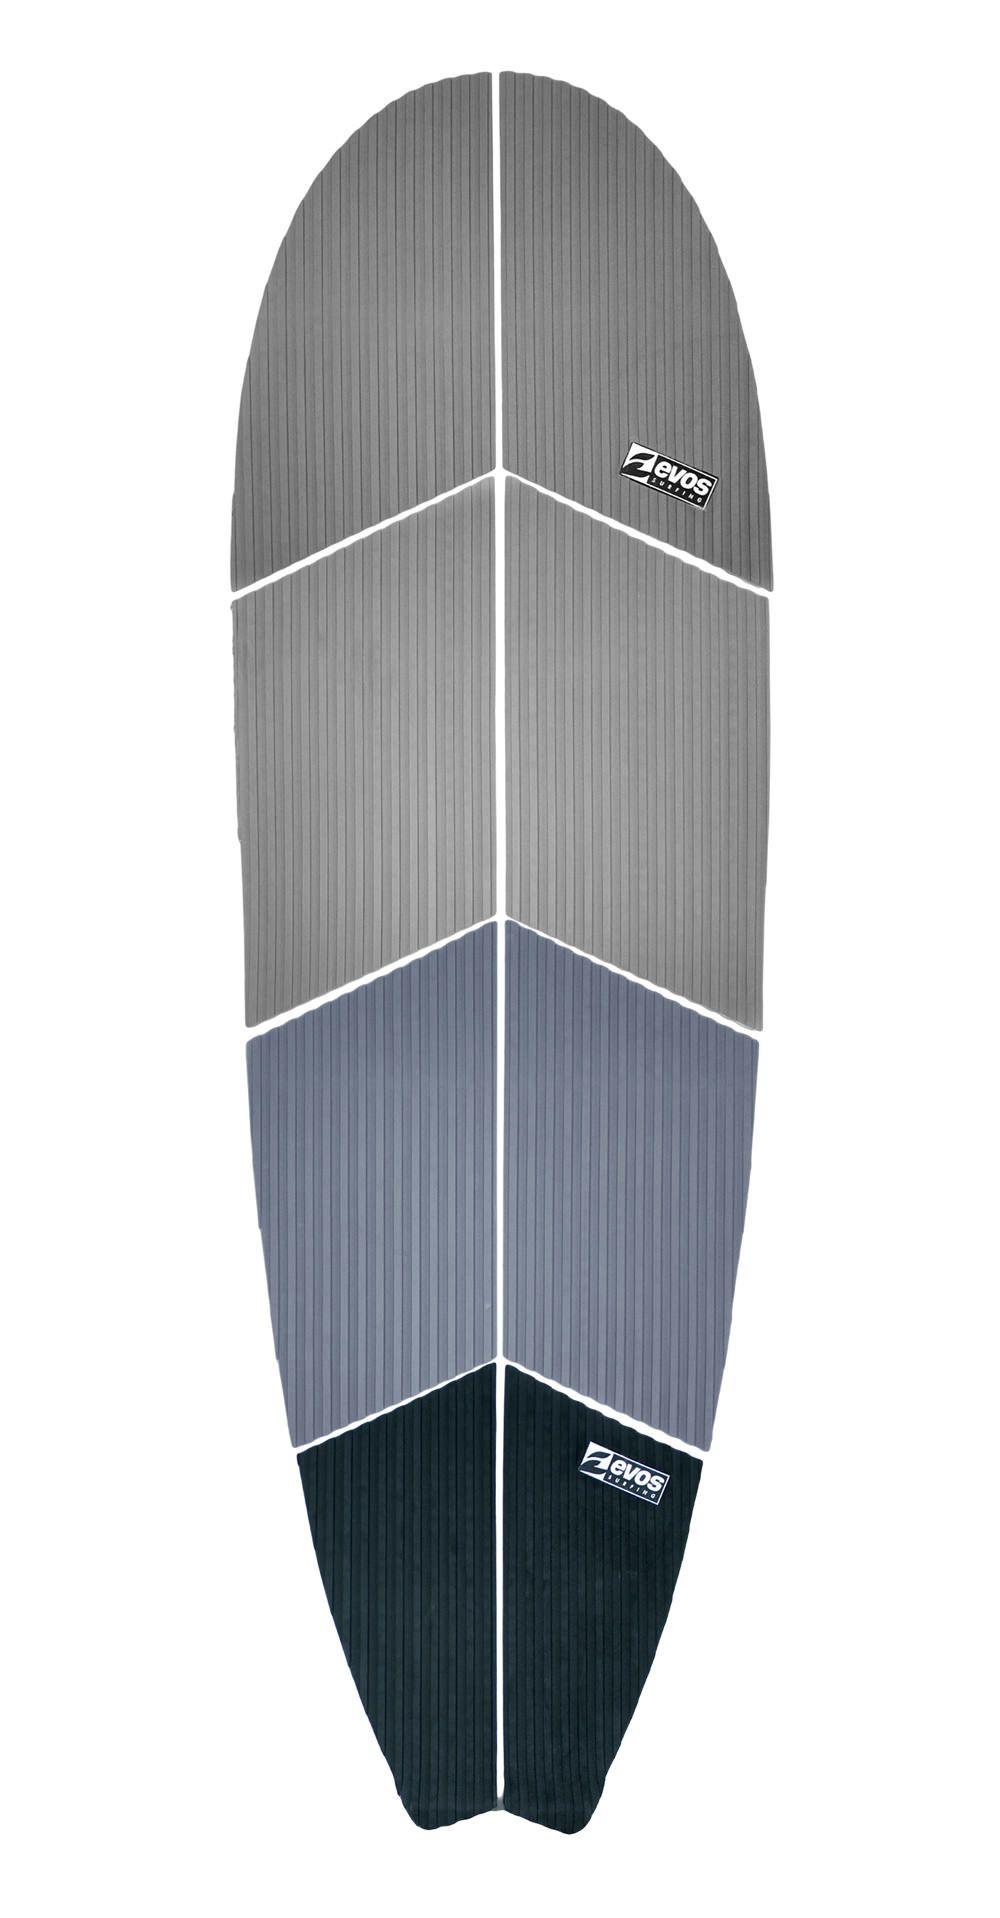 Deck Antiderrapante Evos para Prancha de Stand Up Paddle Preto e Cinza Importado